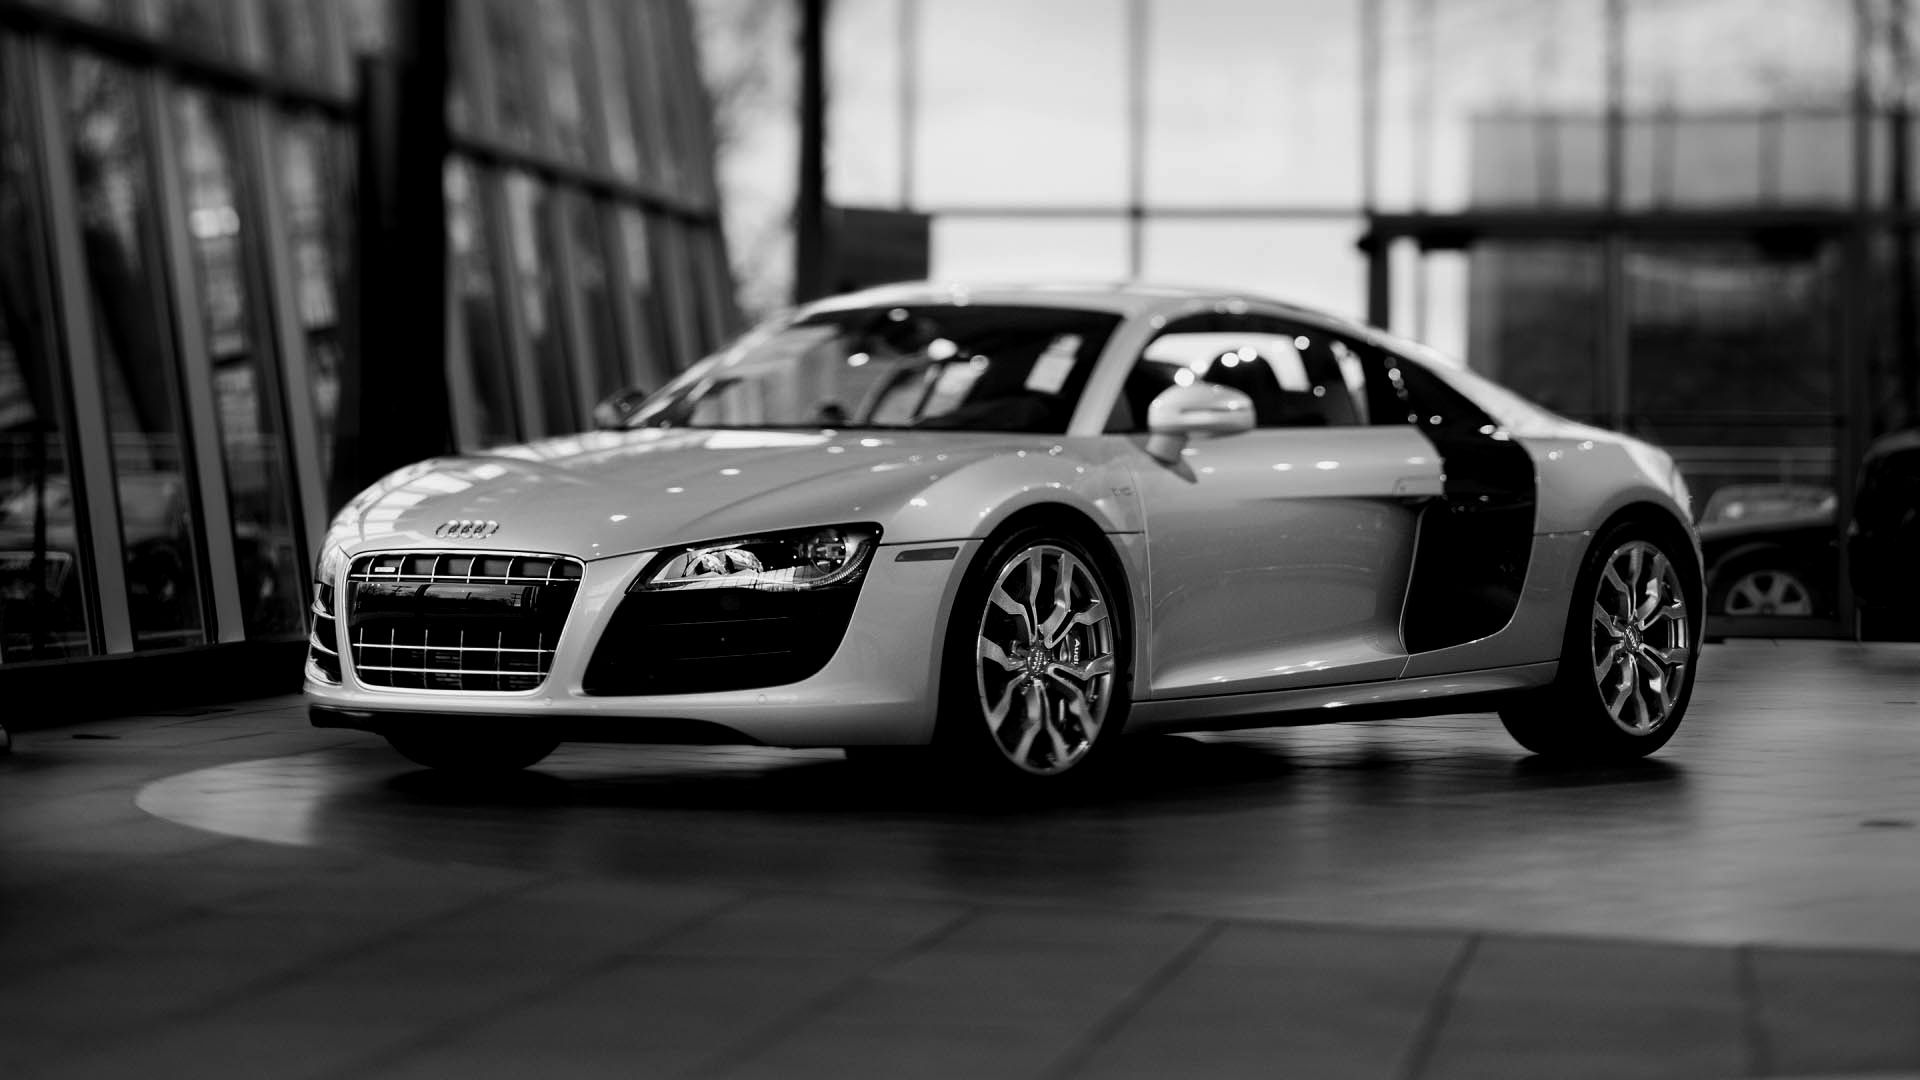 Audi R8 Wallpaper 1080p Wallfree 100 Free High Definition Wallpaper High Definition Background 4k Wallpaper 4k Desktop Background